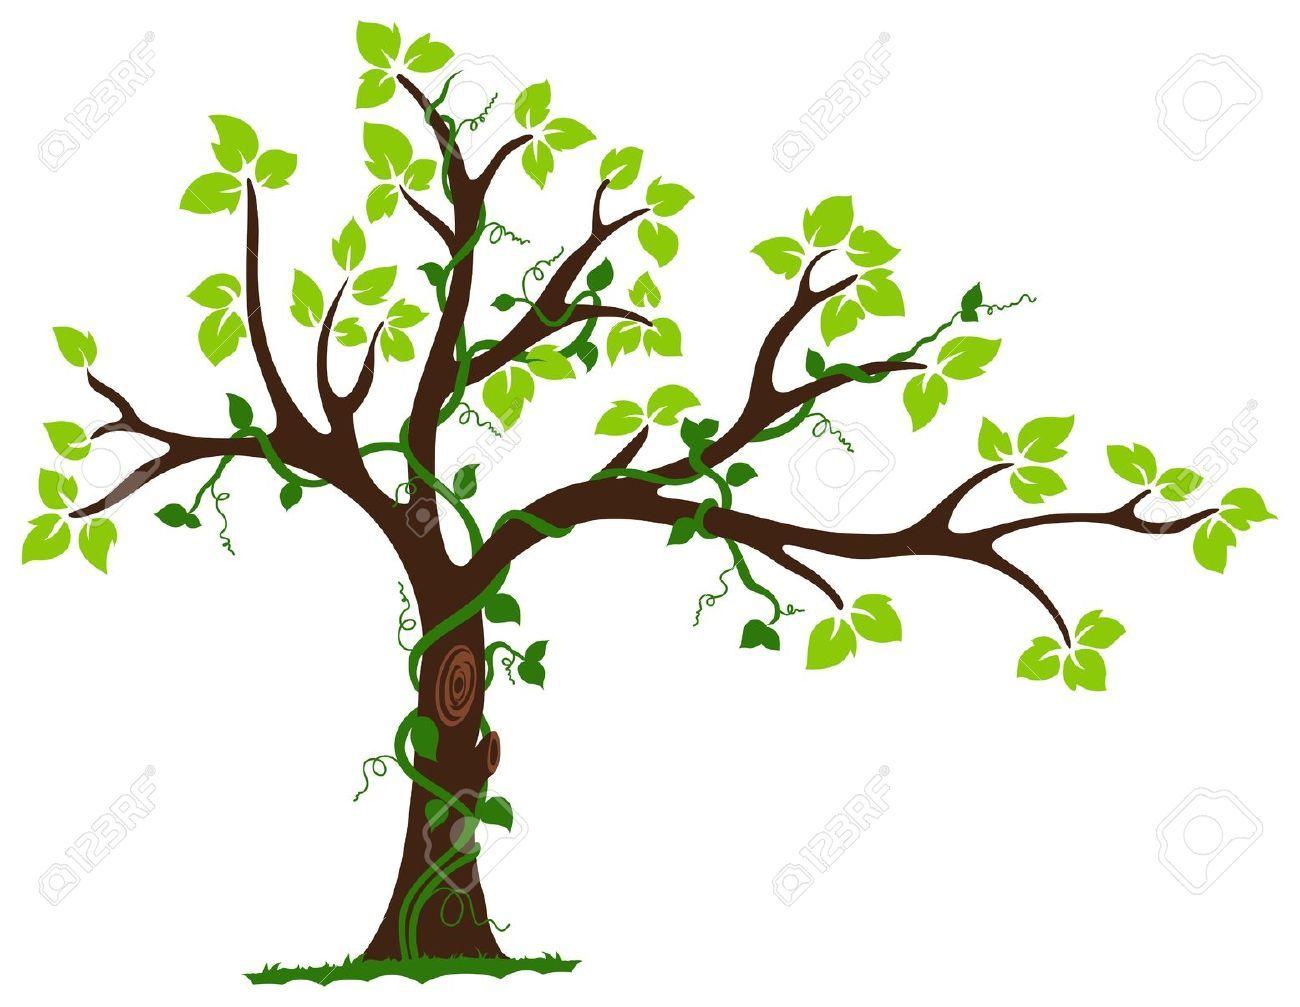 Tree vines clipart jpg freeuse library illustrator tree - Google Search | Art 224 Color My Mood ... jpg freeuse library